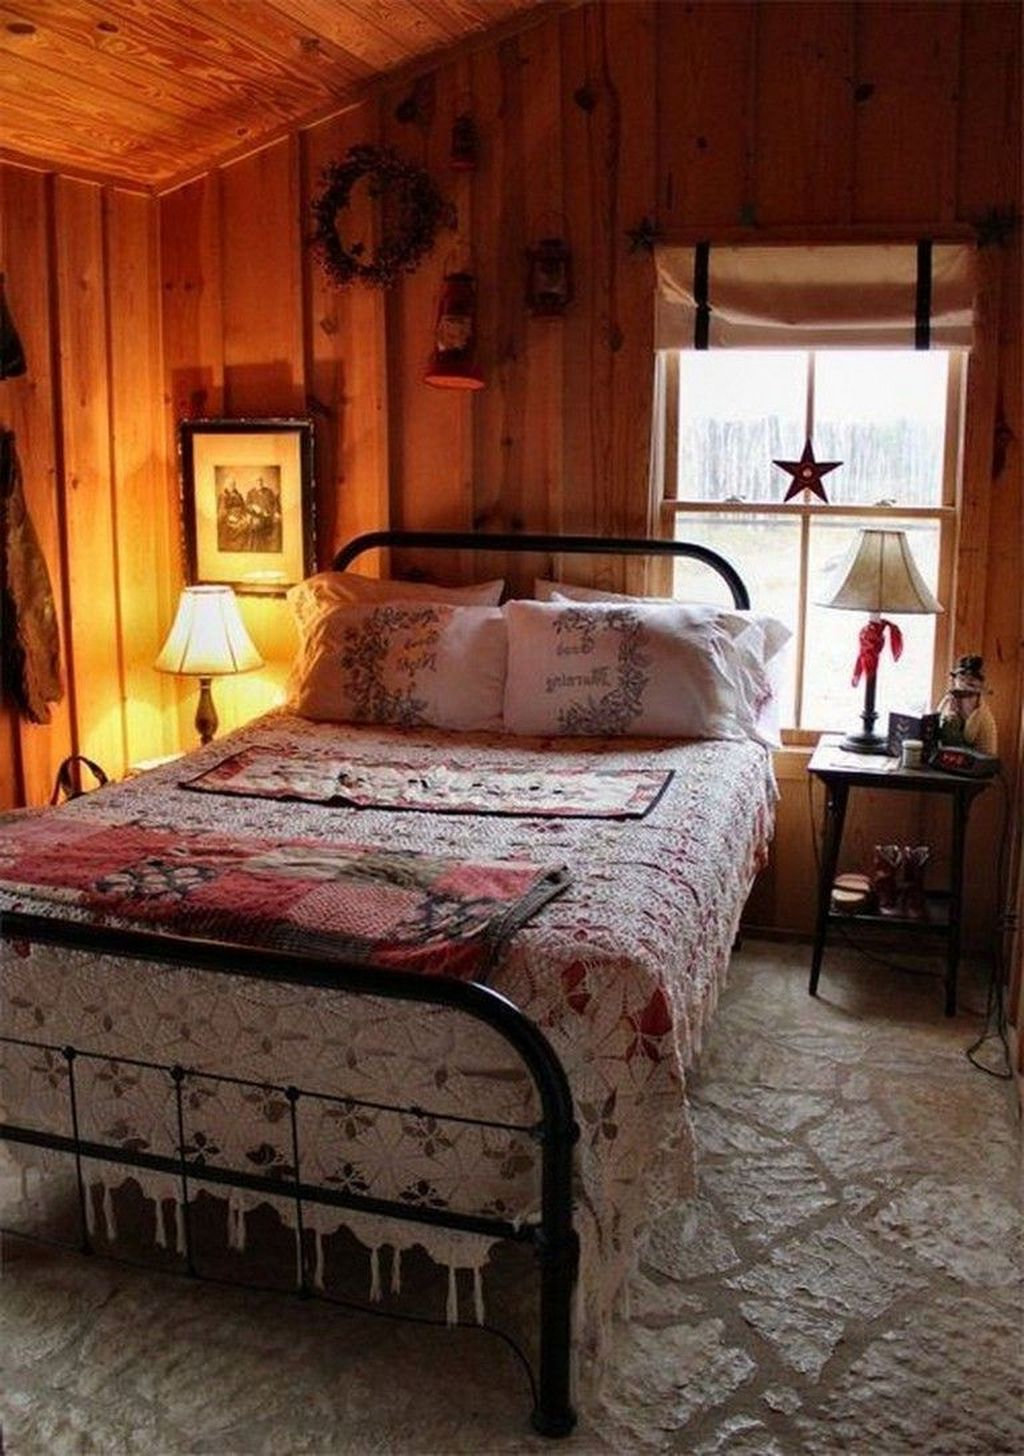 45 perfect winter bedroom decoration ideas cozy cabin on modern cozy bedroom decorating ideas id=54292